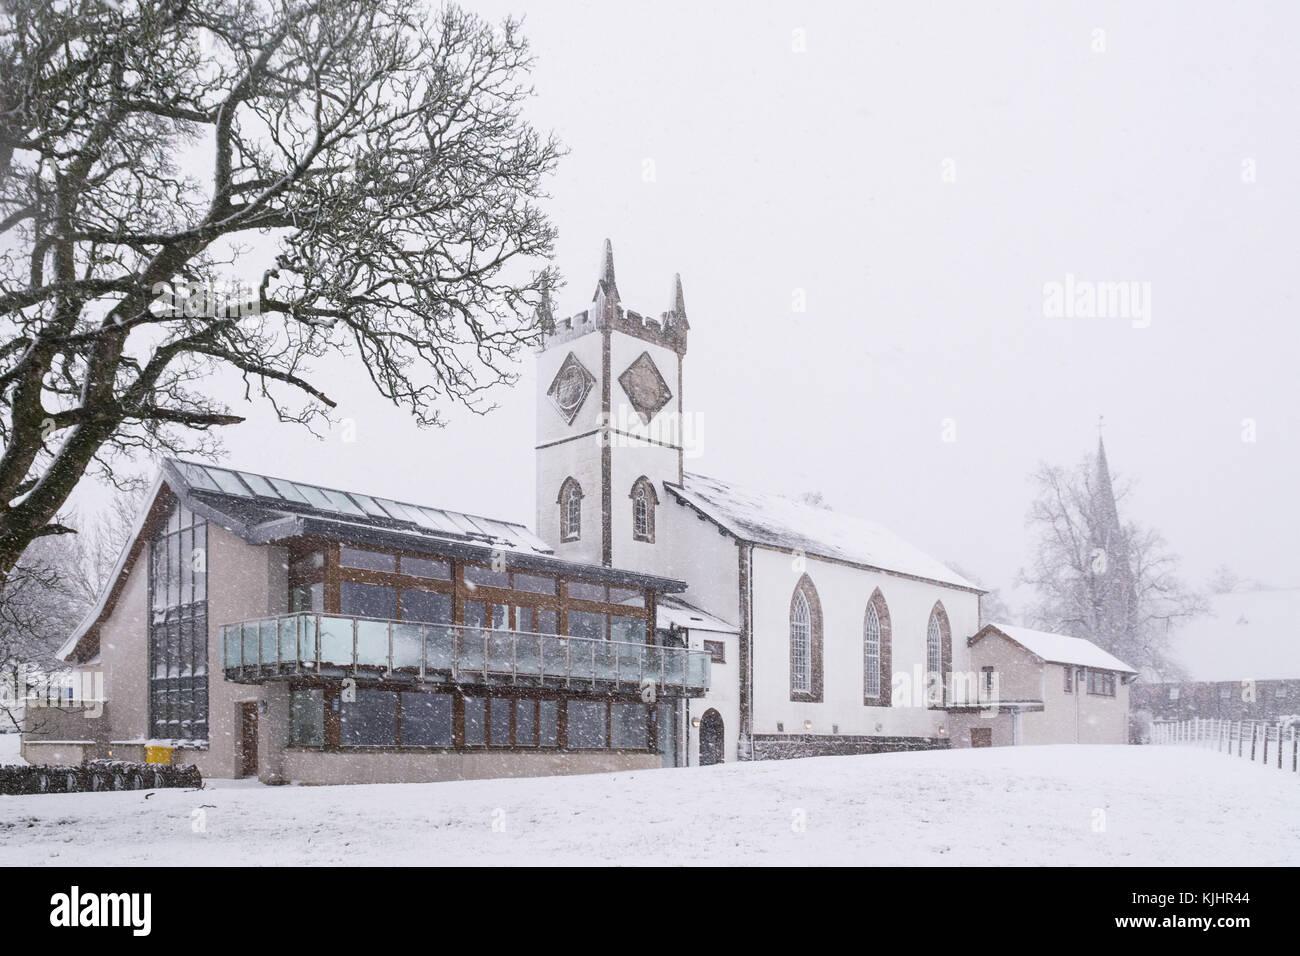 Killearn Village Hall im Winter, killearn, Stirlingshire, Schottland Großbritannien Stockbild